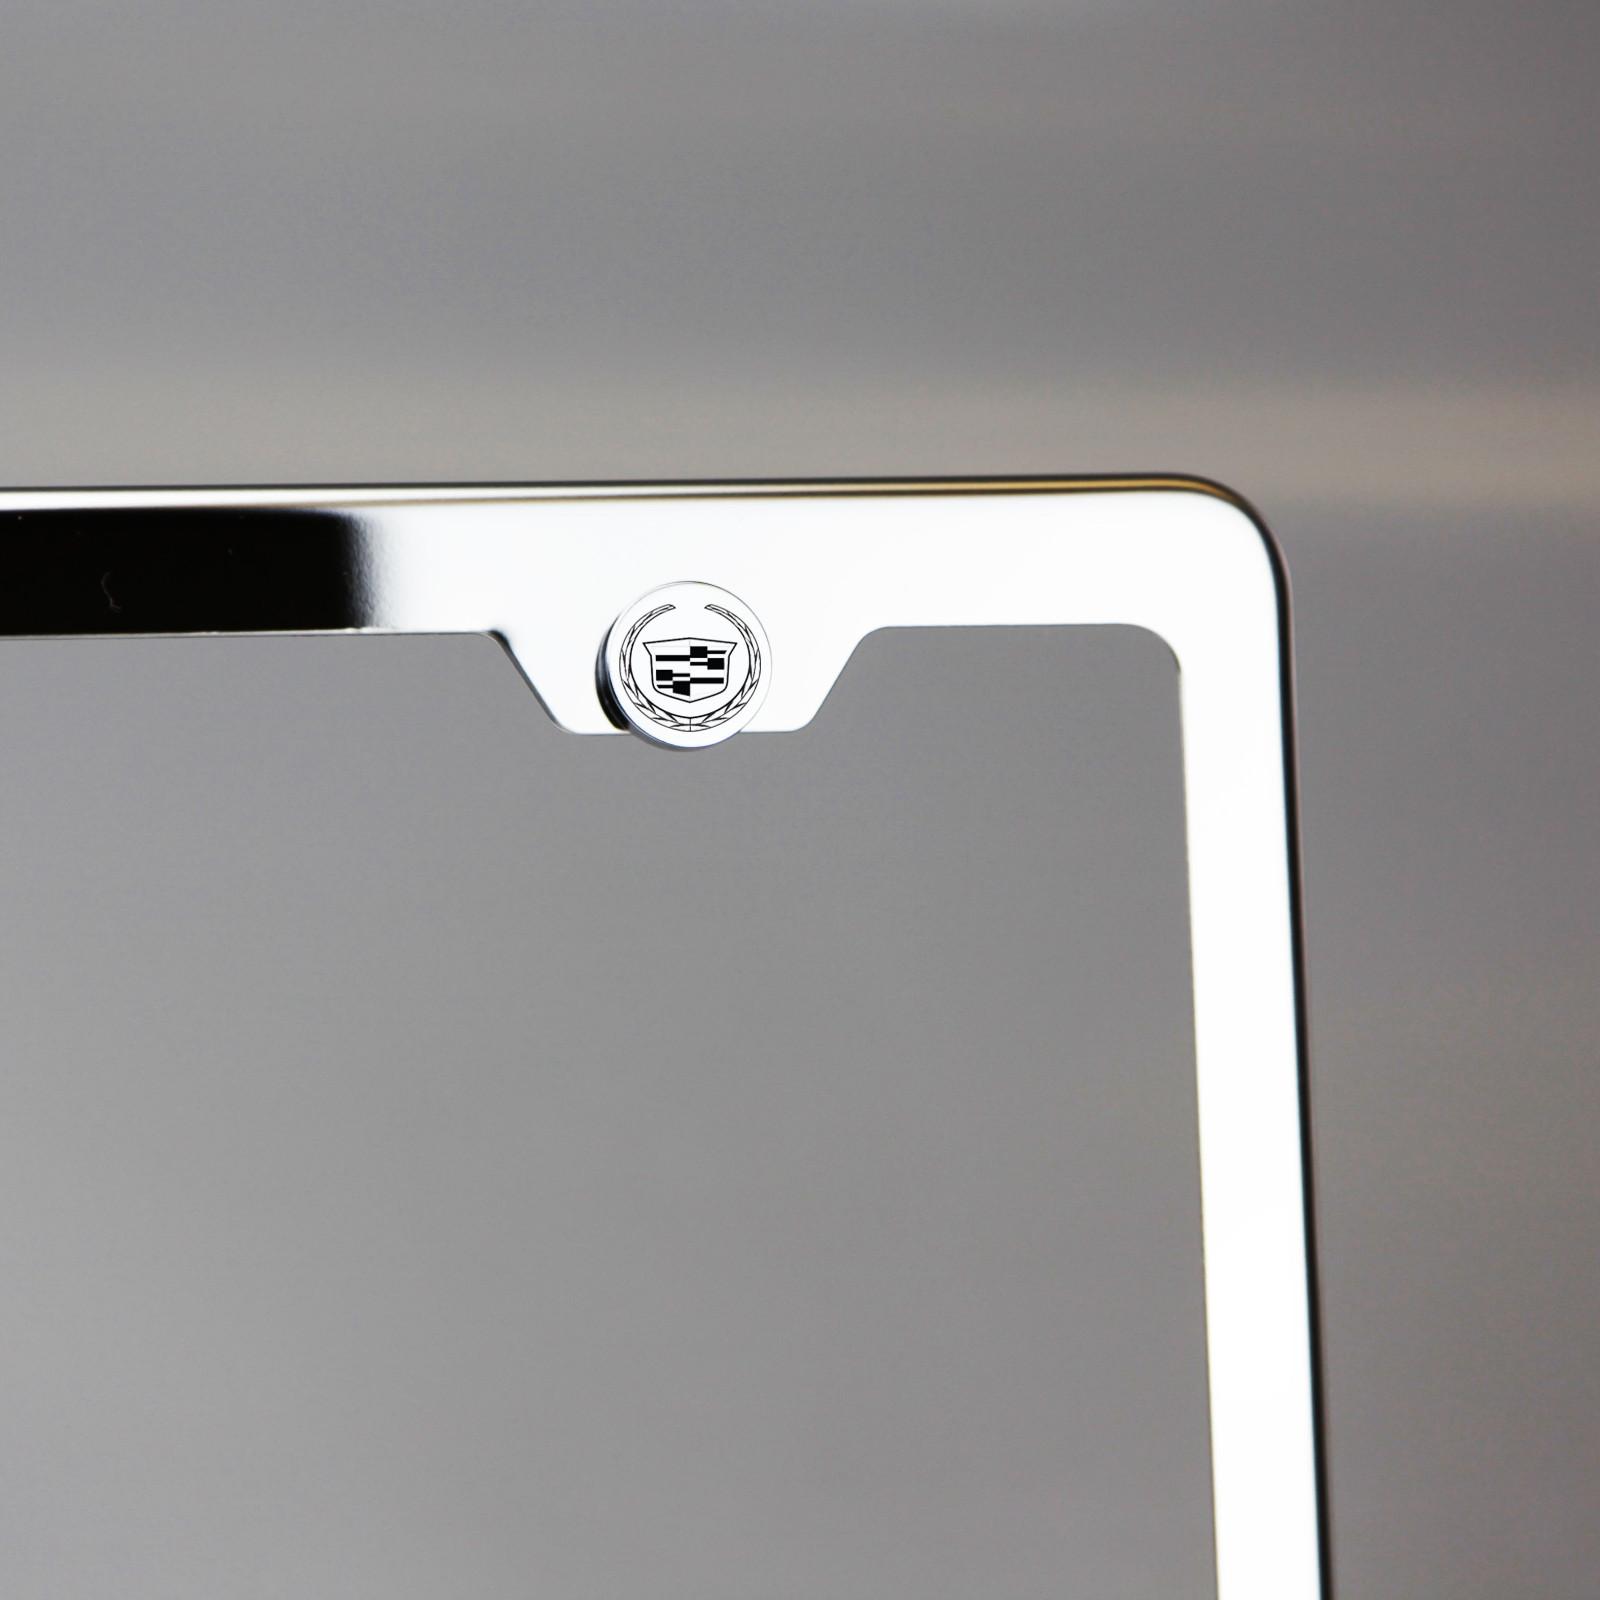 Laser Etched Black New Cadillac License Plate Frame Fastener Chrome Screws Cap